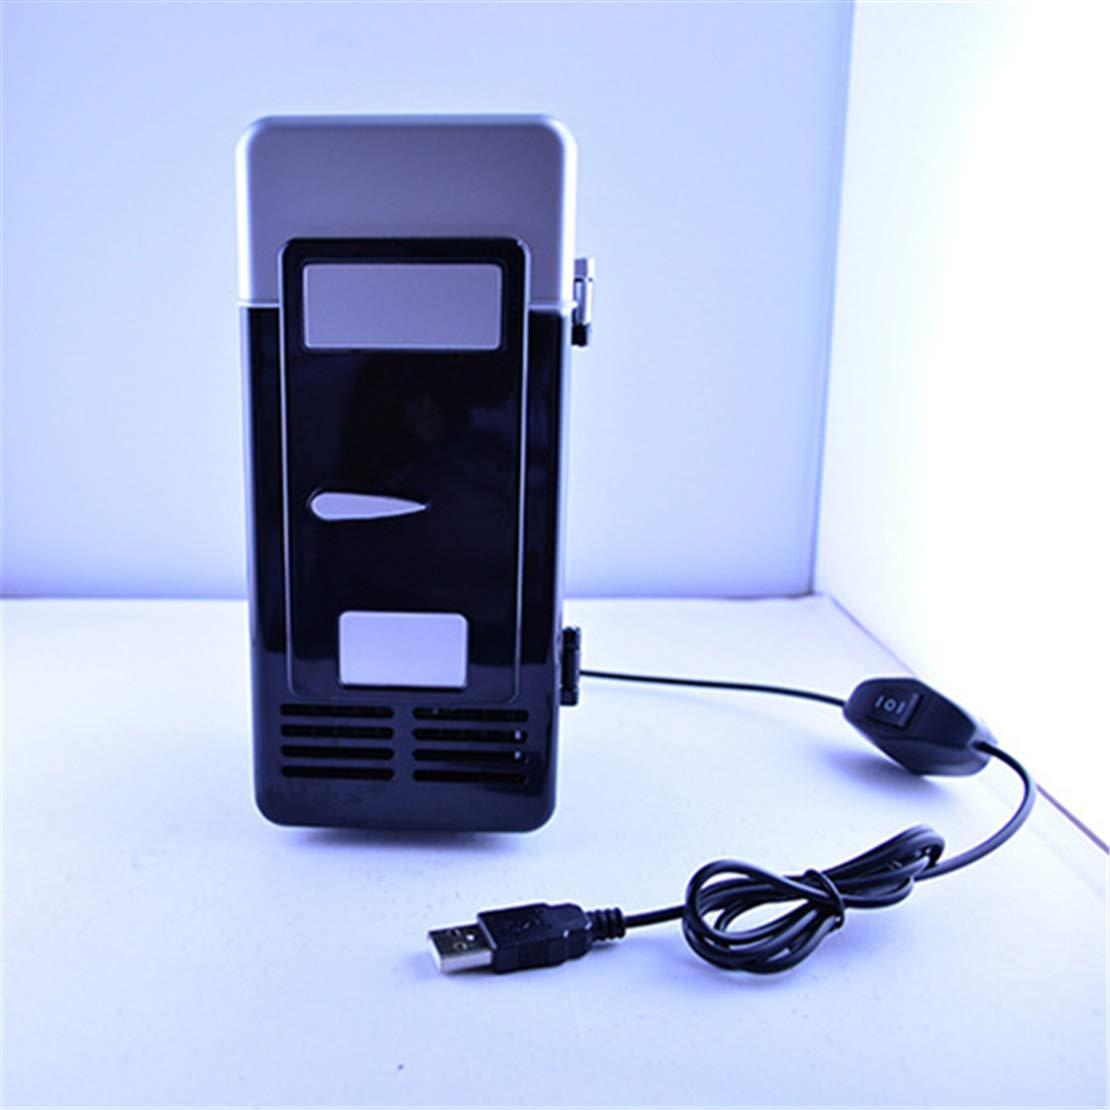 Mini Nevera USB Nevera Nevera para 1 Lata: Amazon.es: Deportes y ...